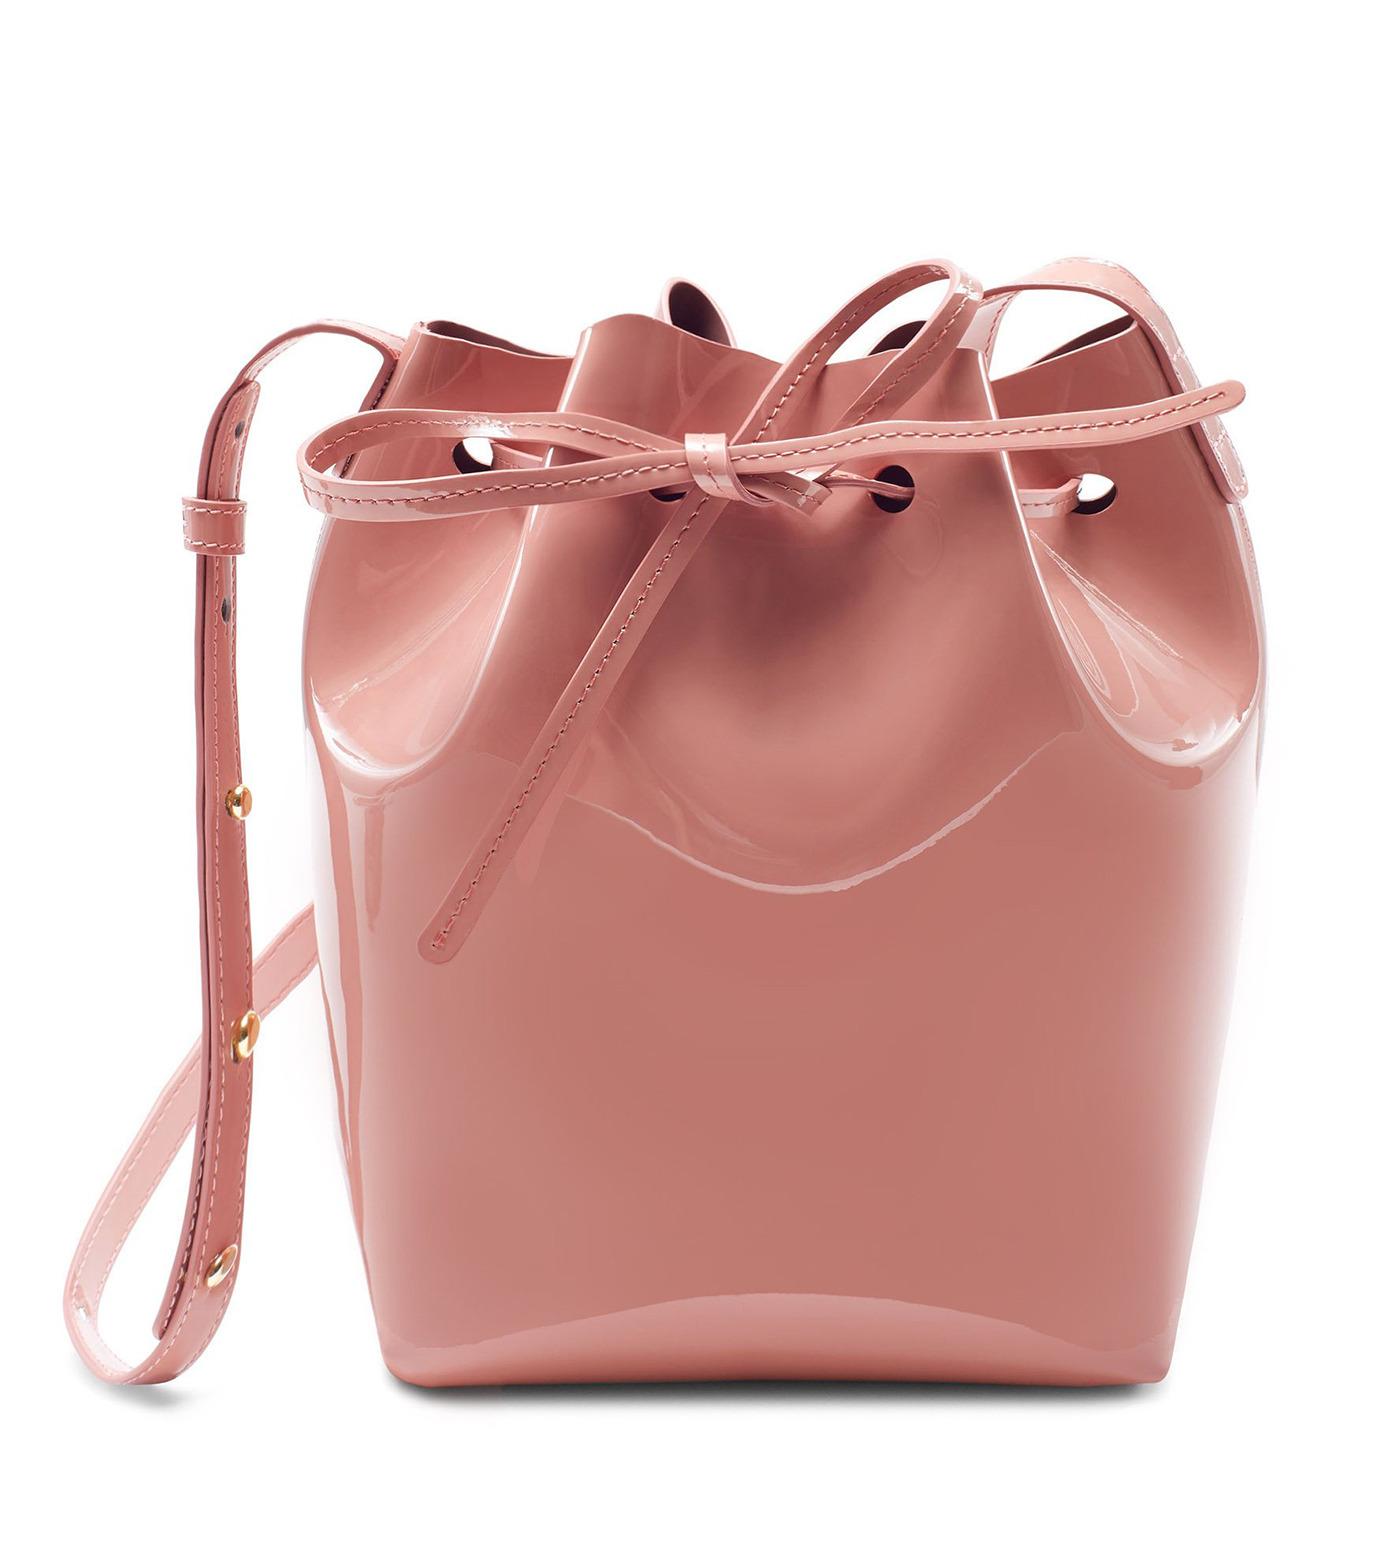 Mansur Gavriel(マンサーガブリエル)のpatent mini bucket bag-LIGHT PINK(ハンドバッグ/hand bag)-HMB004PA-71 拡大詳細画像1